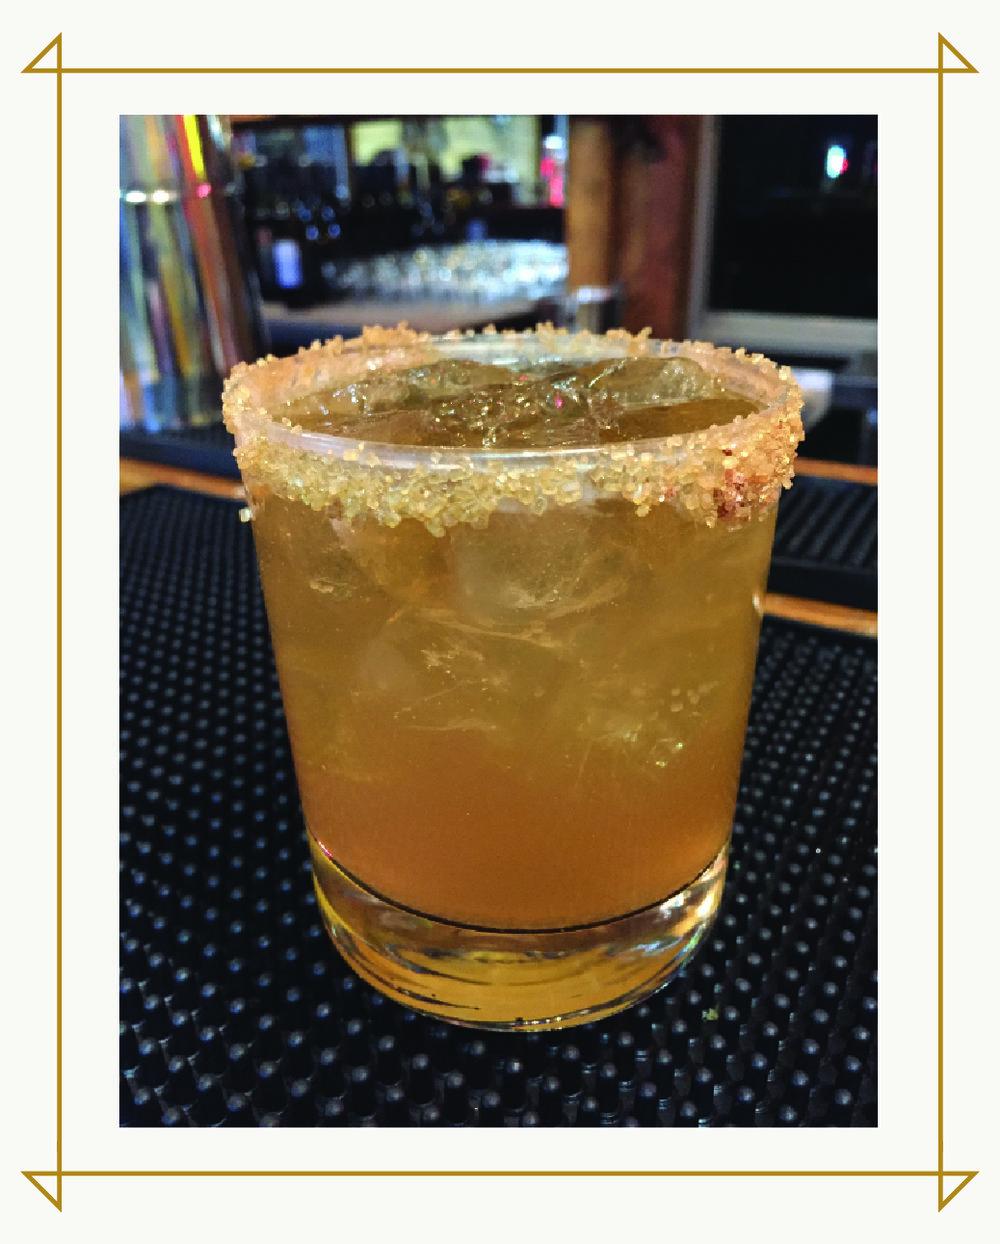 bourbon picture.jpg